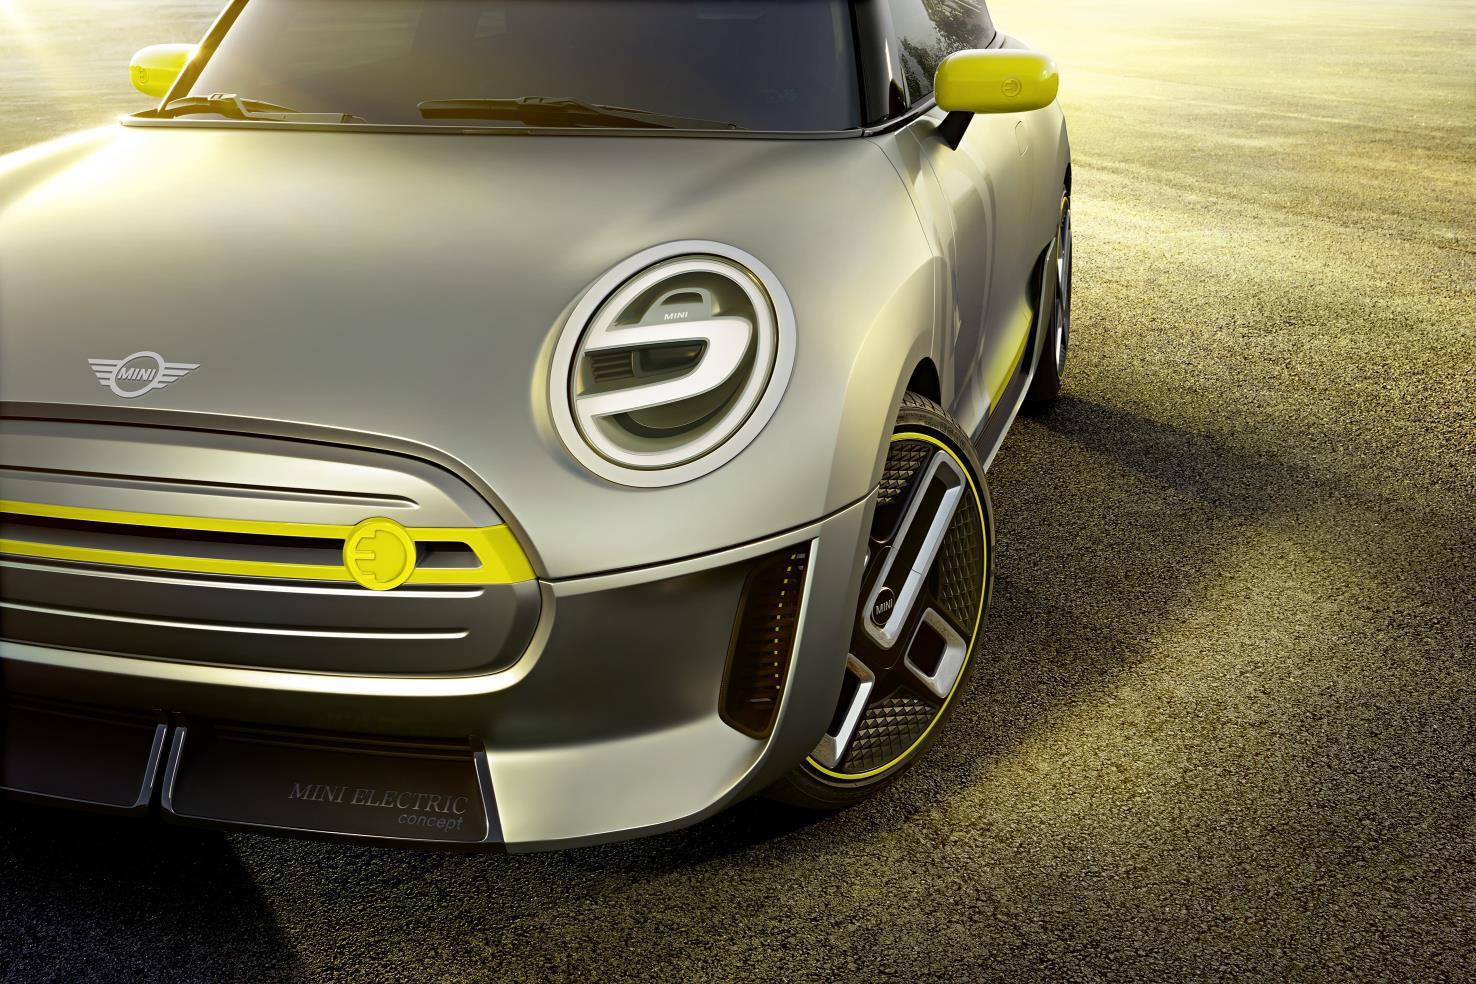 Mini Electric Concept front bumper